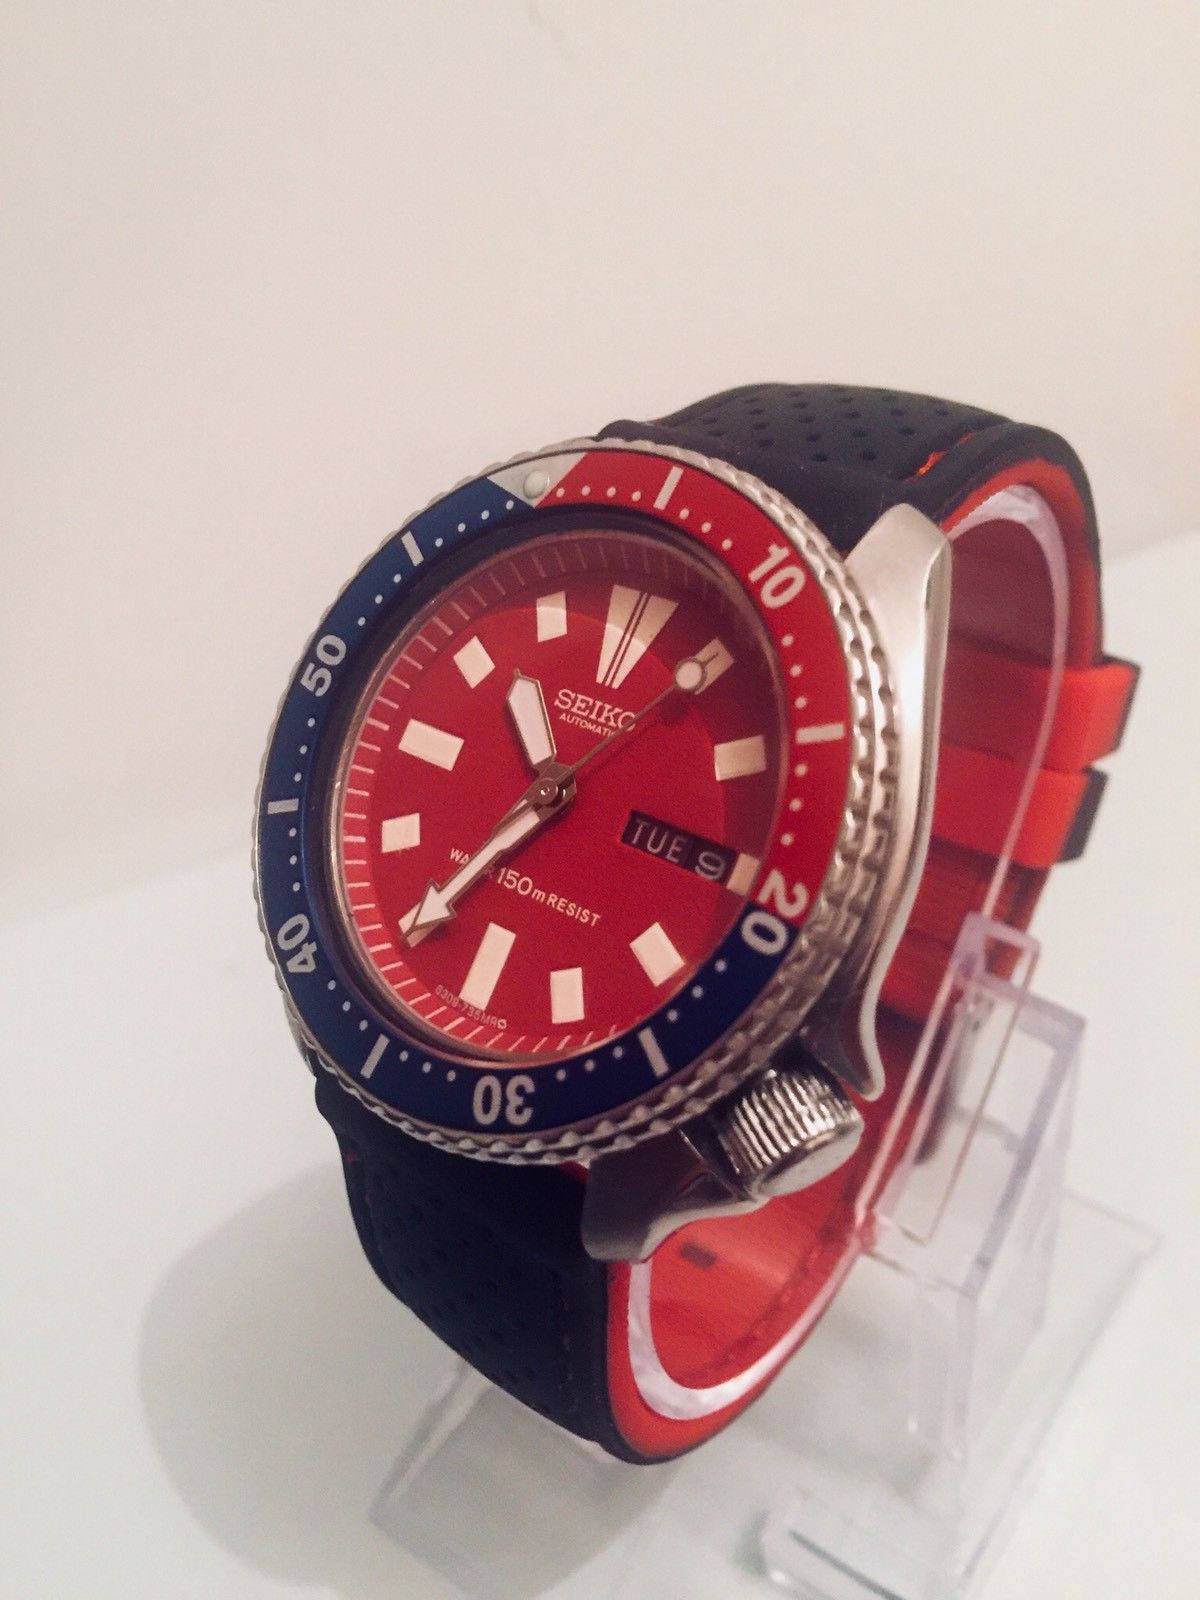 aed8d2534e1f2 SEIKO 150M Scuba Diver Day Date Automatic mens watch 6309-7290 ...